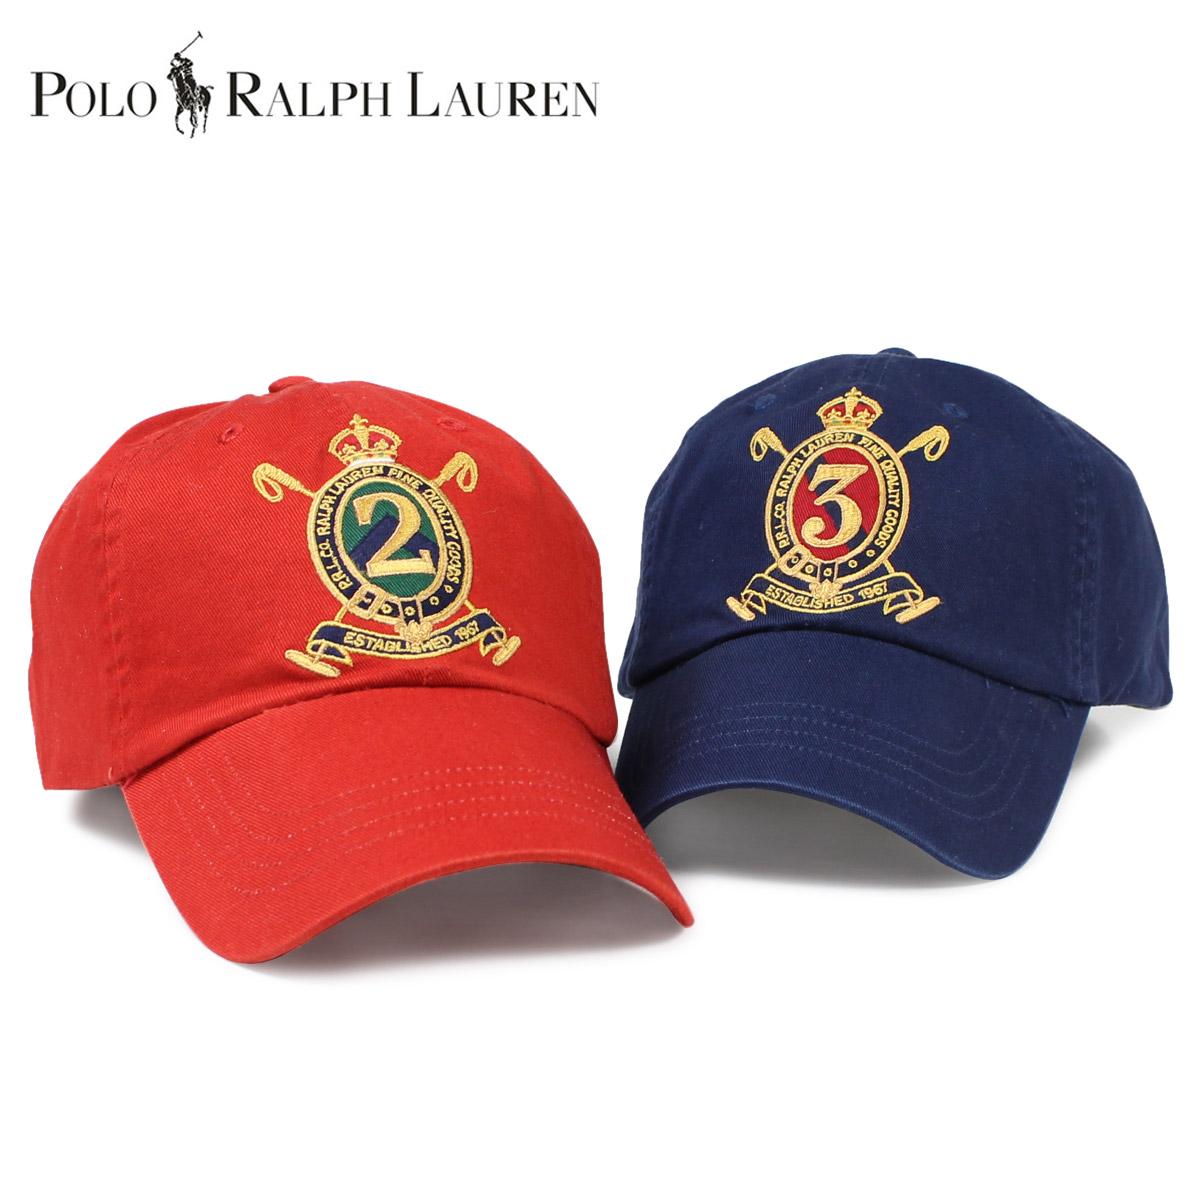 ALLSPORTS  Ralph Lauren Hat mens Cap POLO RALPH LAUREN COTTON TWILL SPORTS  CAP ladies  11   8 new in stock   19b19b4782f8